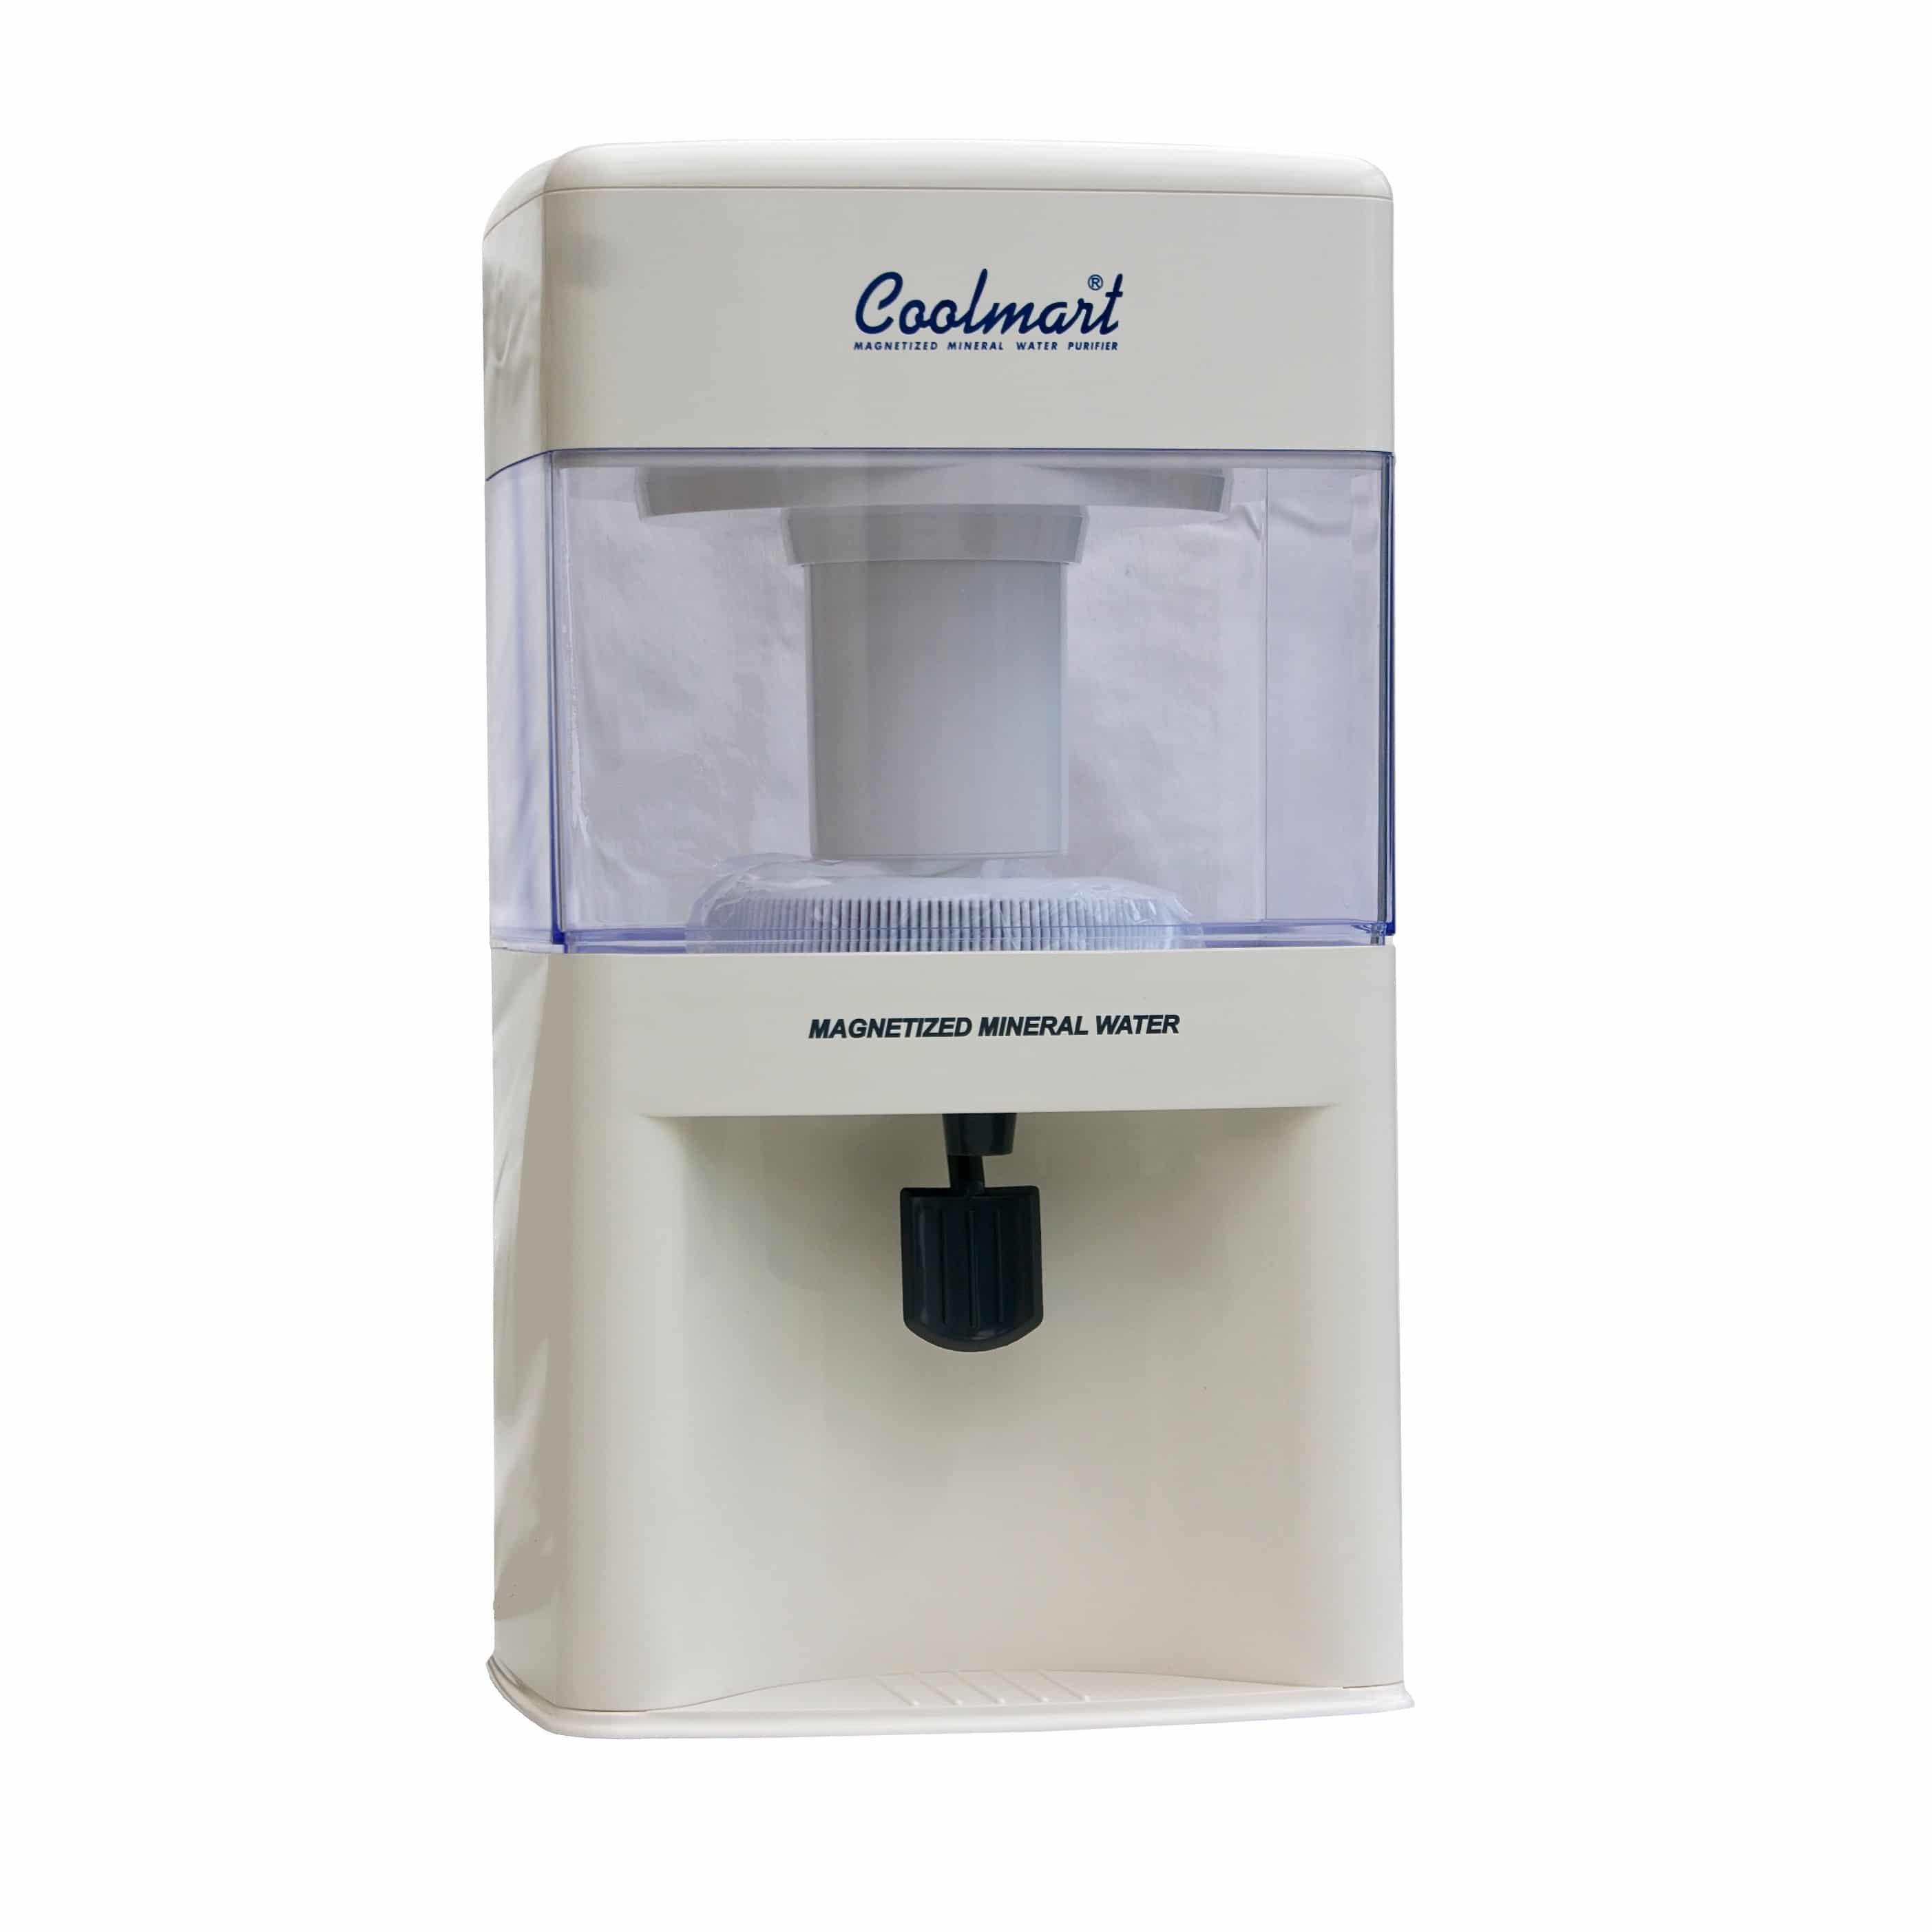 Fontaine-cm-201-coolmart-doonam